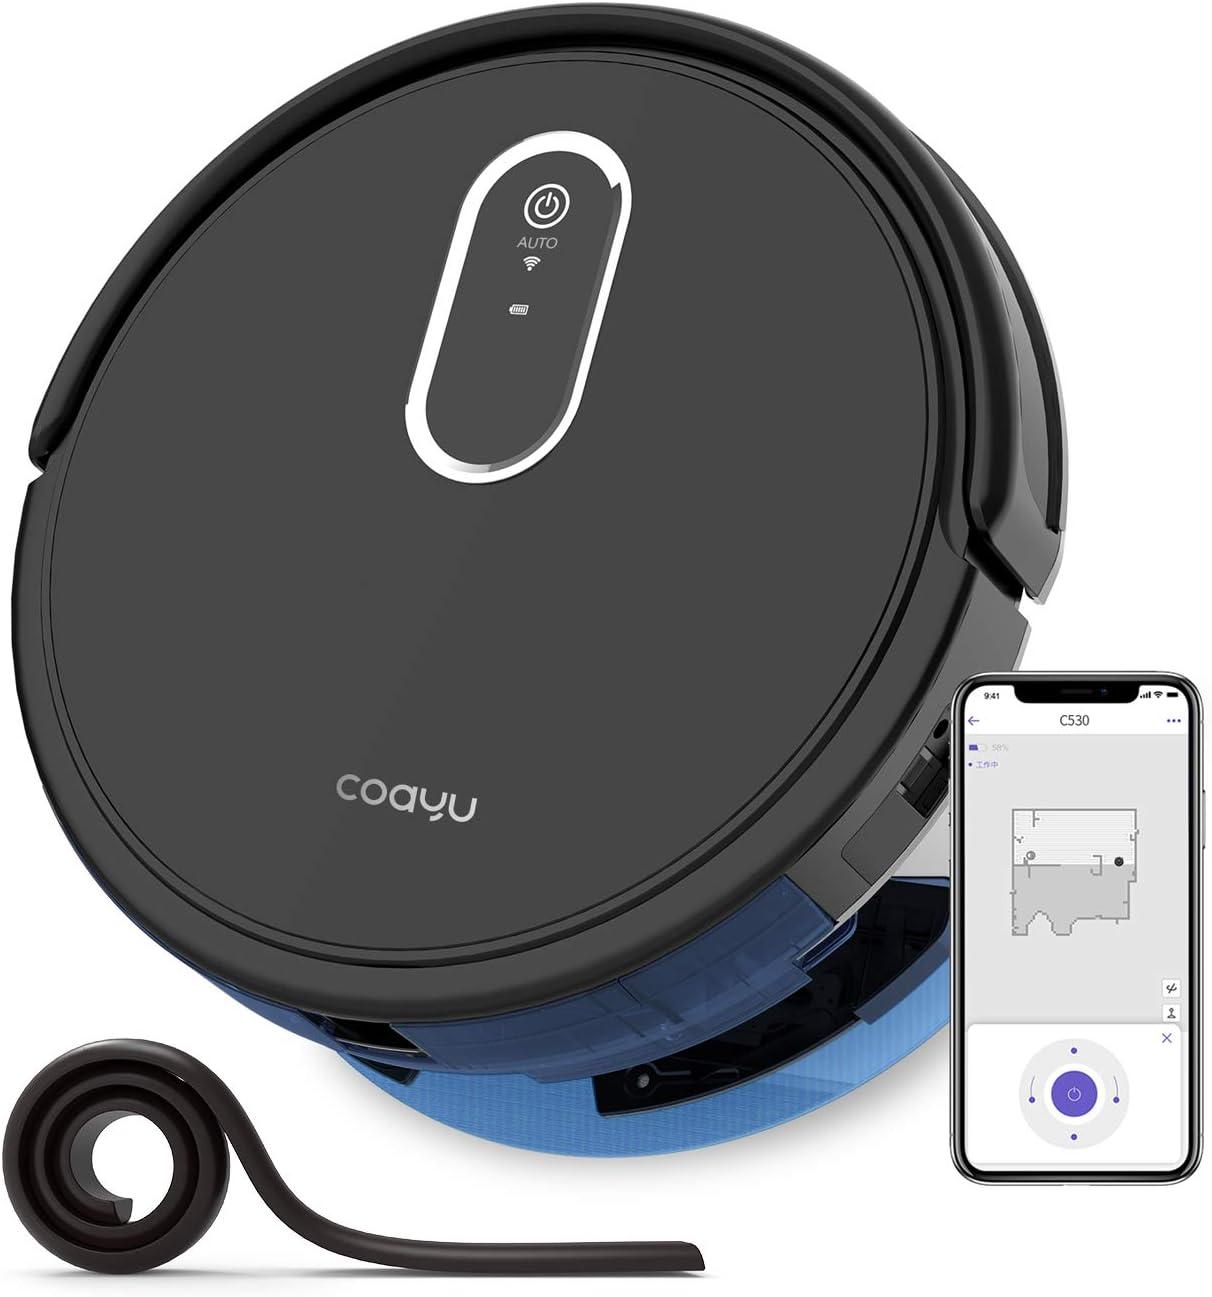 COAYU C530 Alexa App Control,Robotic